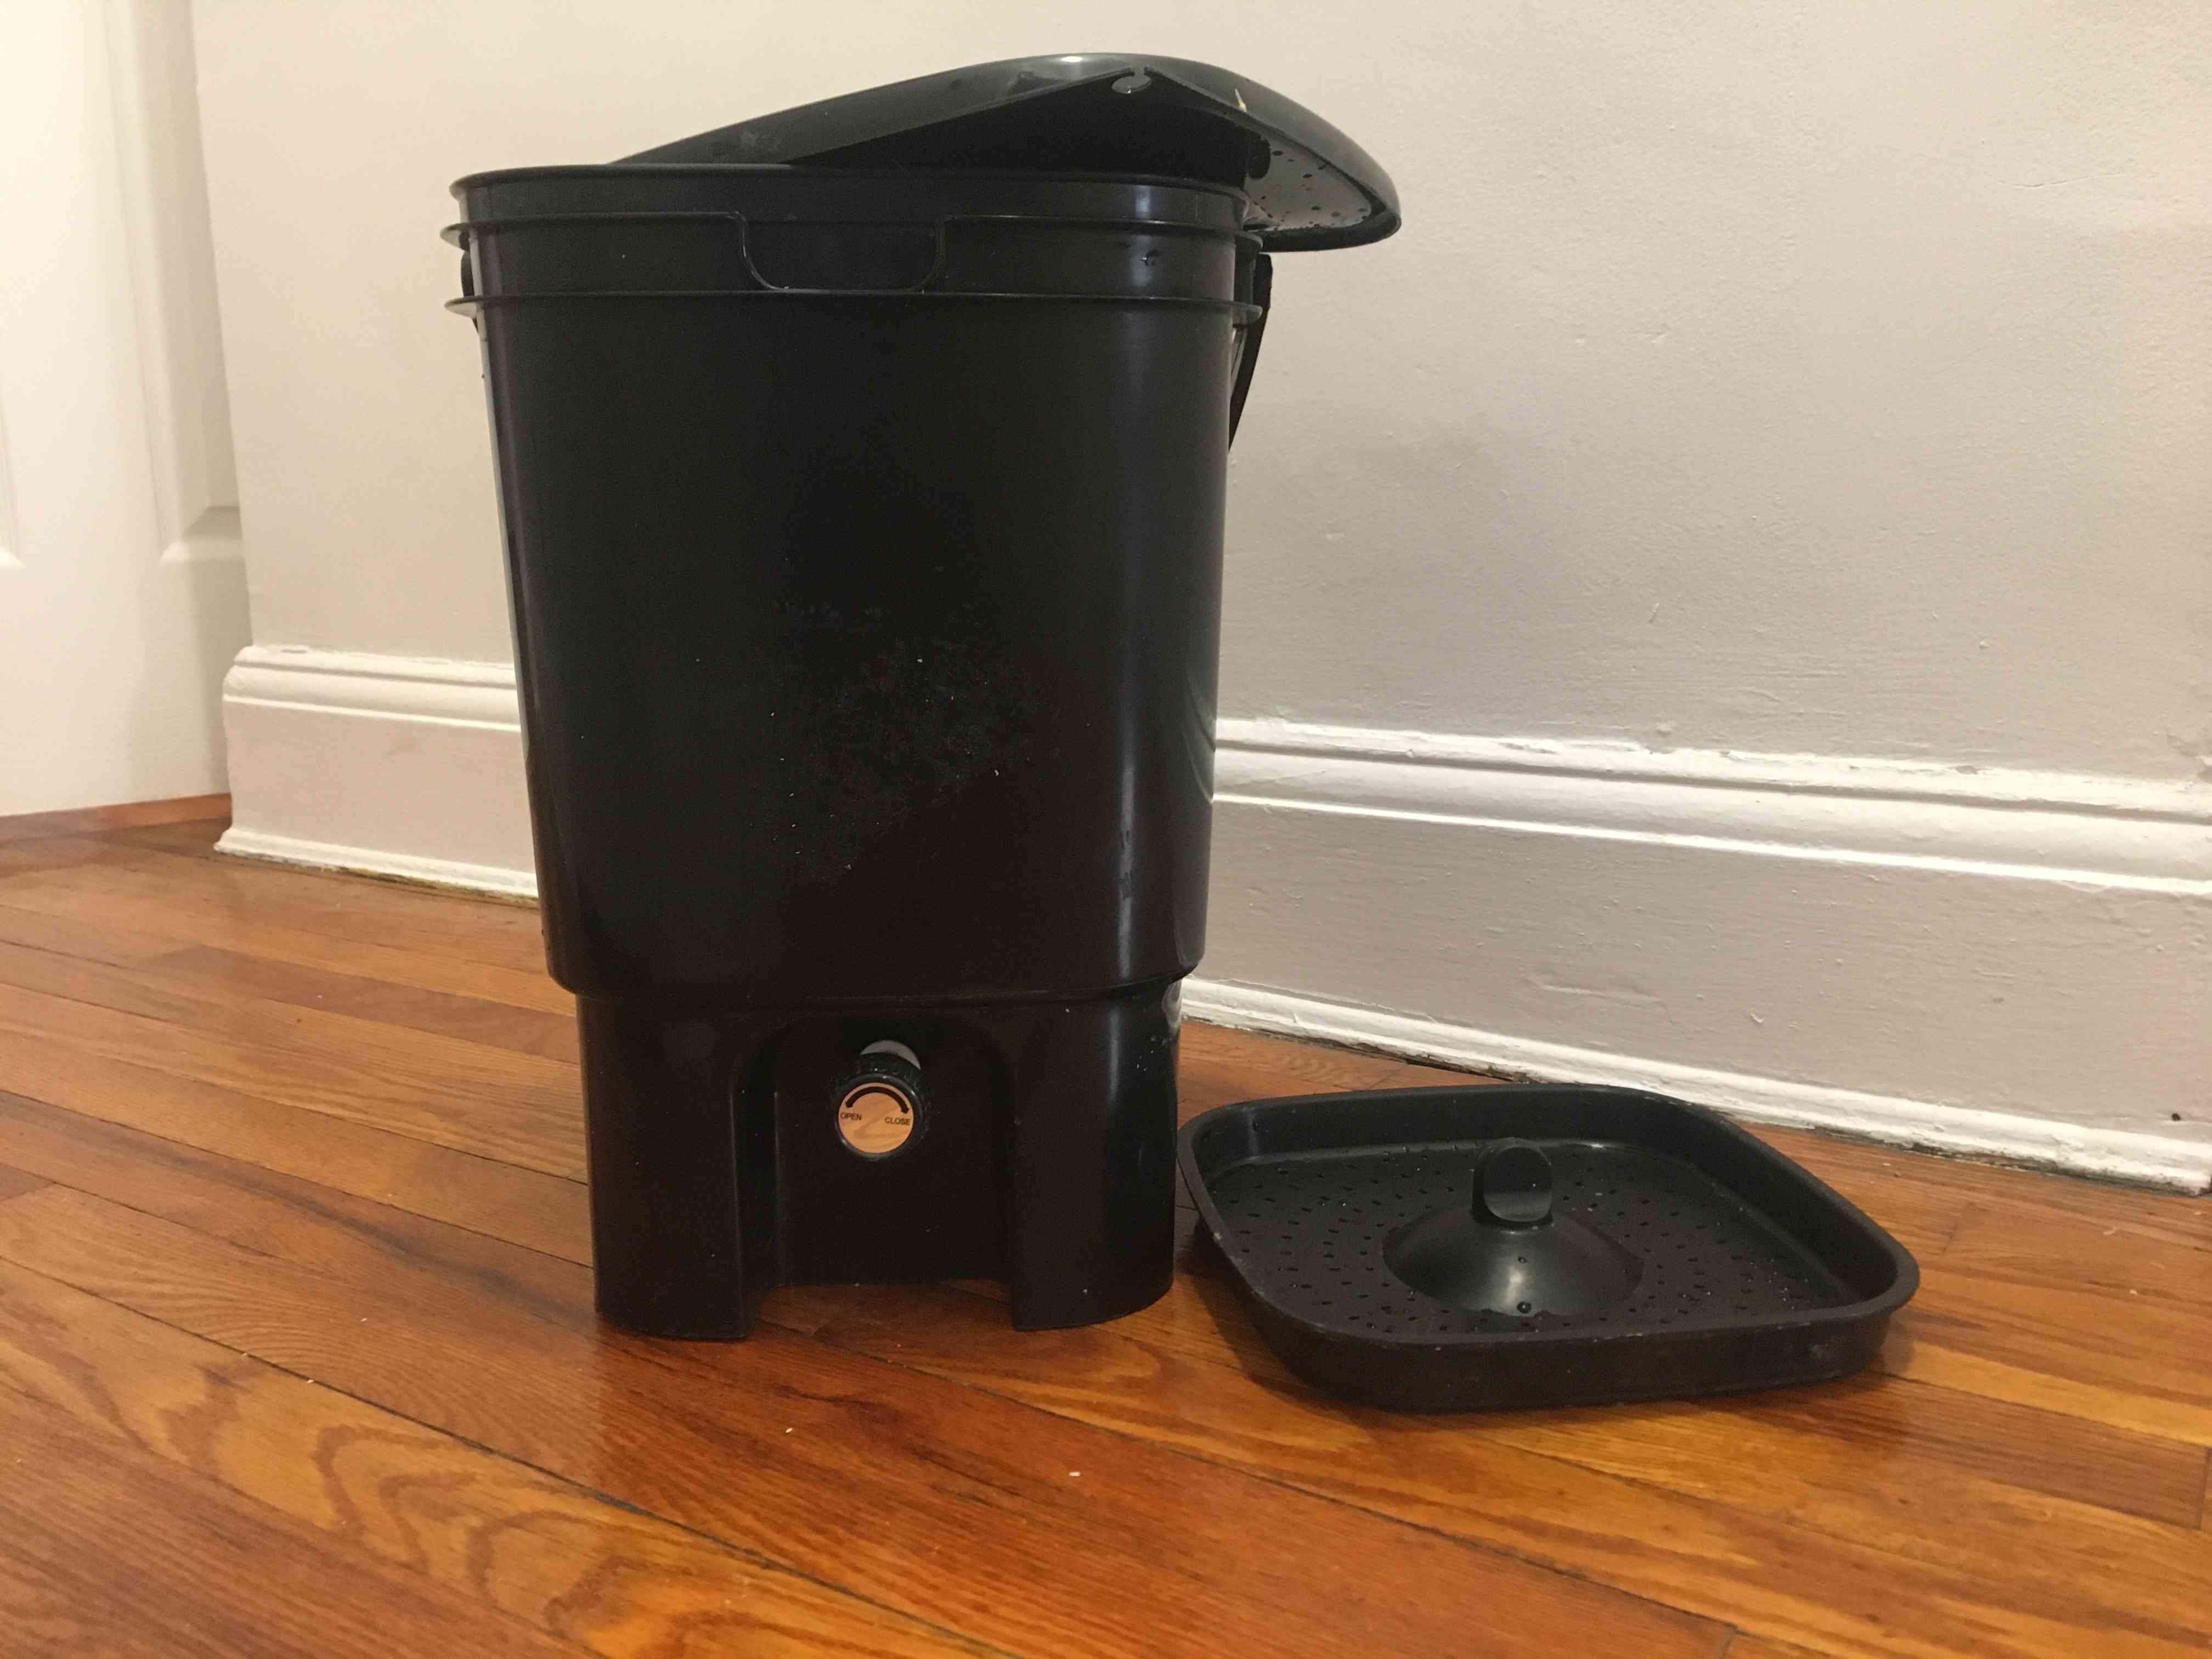 Bokashi Bucket with tray removed